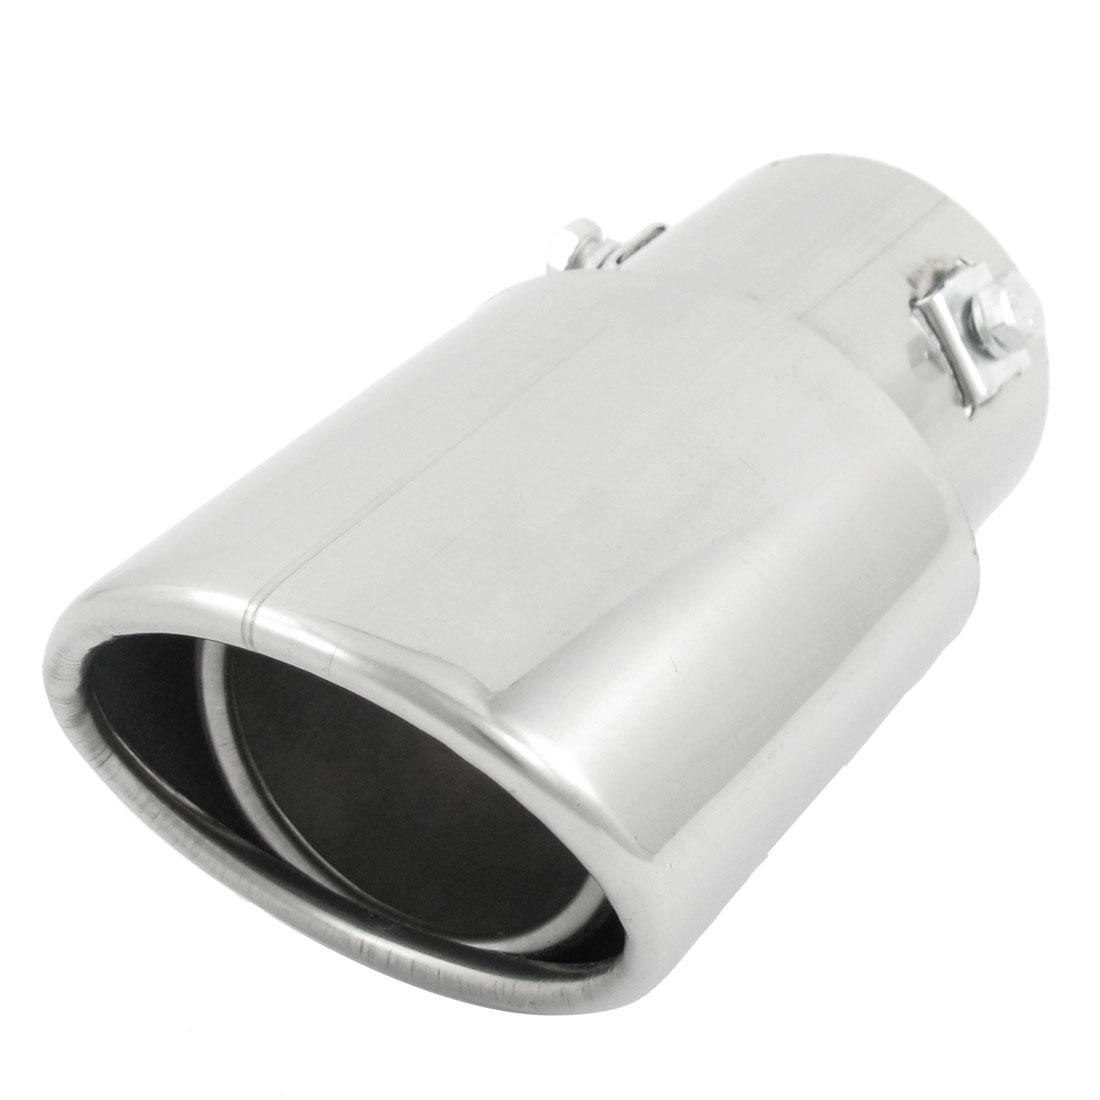 "Silver Tone Metal 2.4"" Diameter Inlet Exhaust Pipe Tail Muffler Tip"